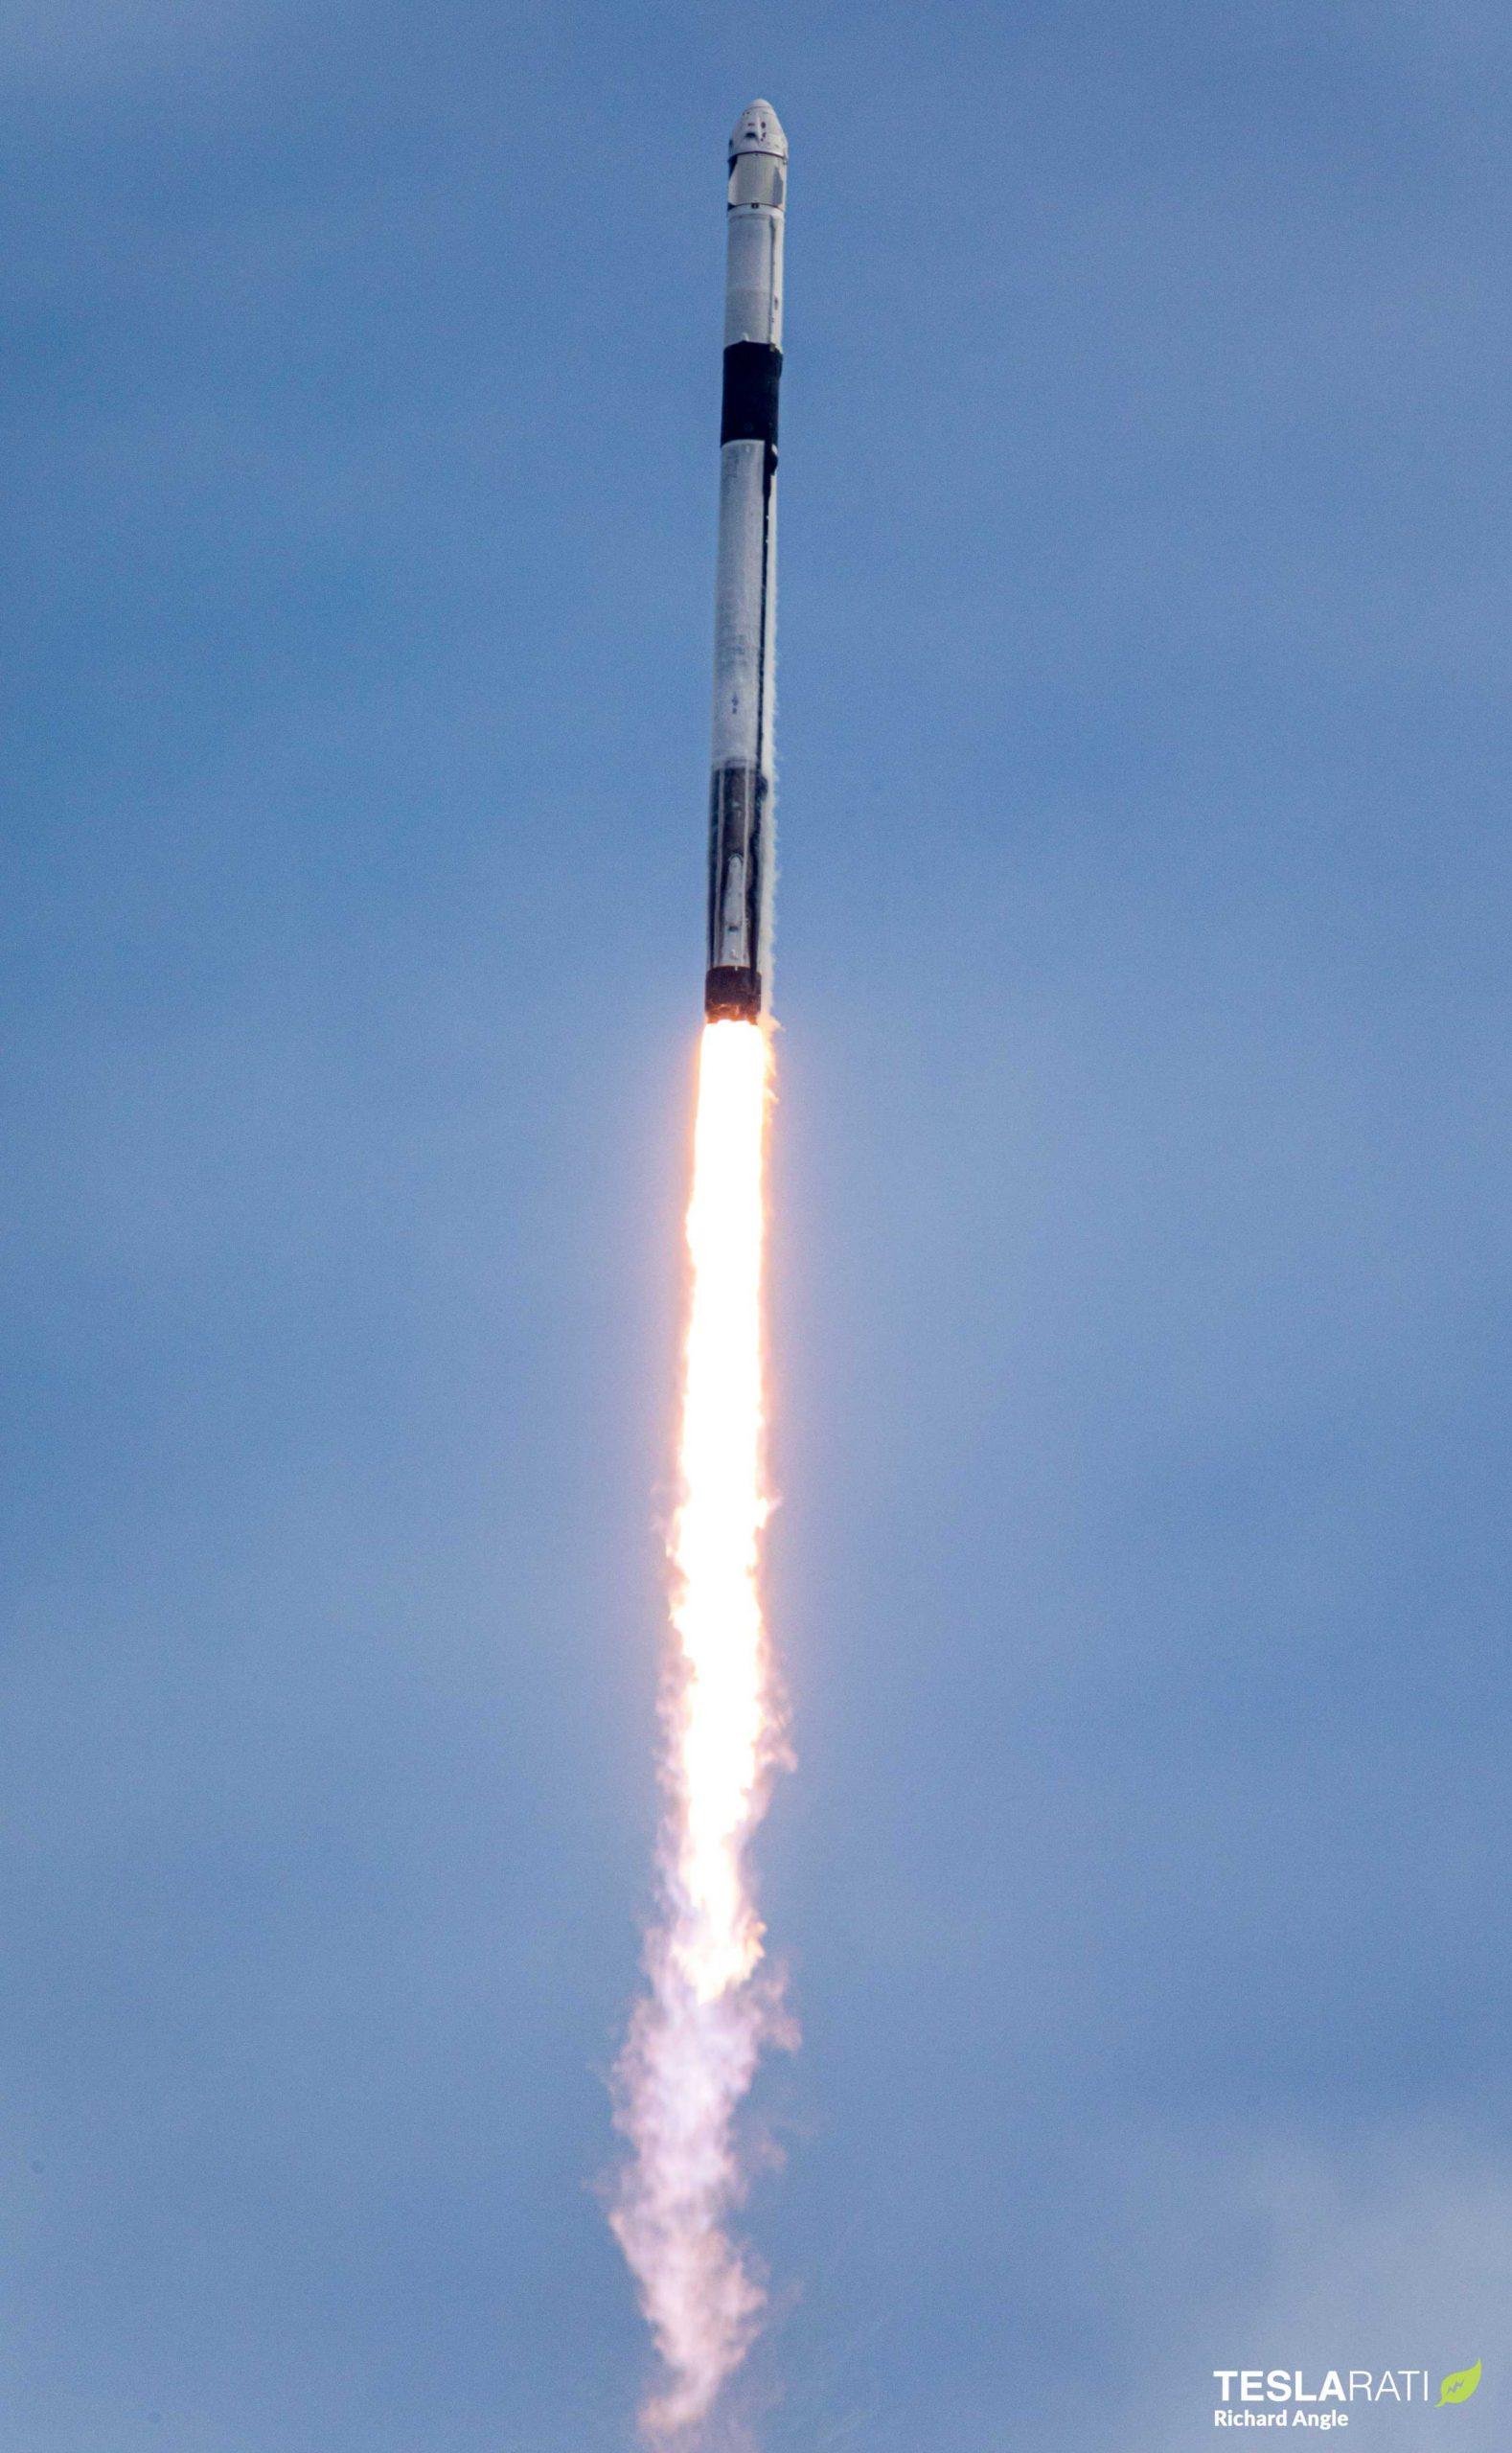 Crew Dragon C205 F9 B1046 IFA 39A launch 011920 (Richard Angle) (3) (c)